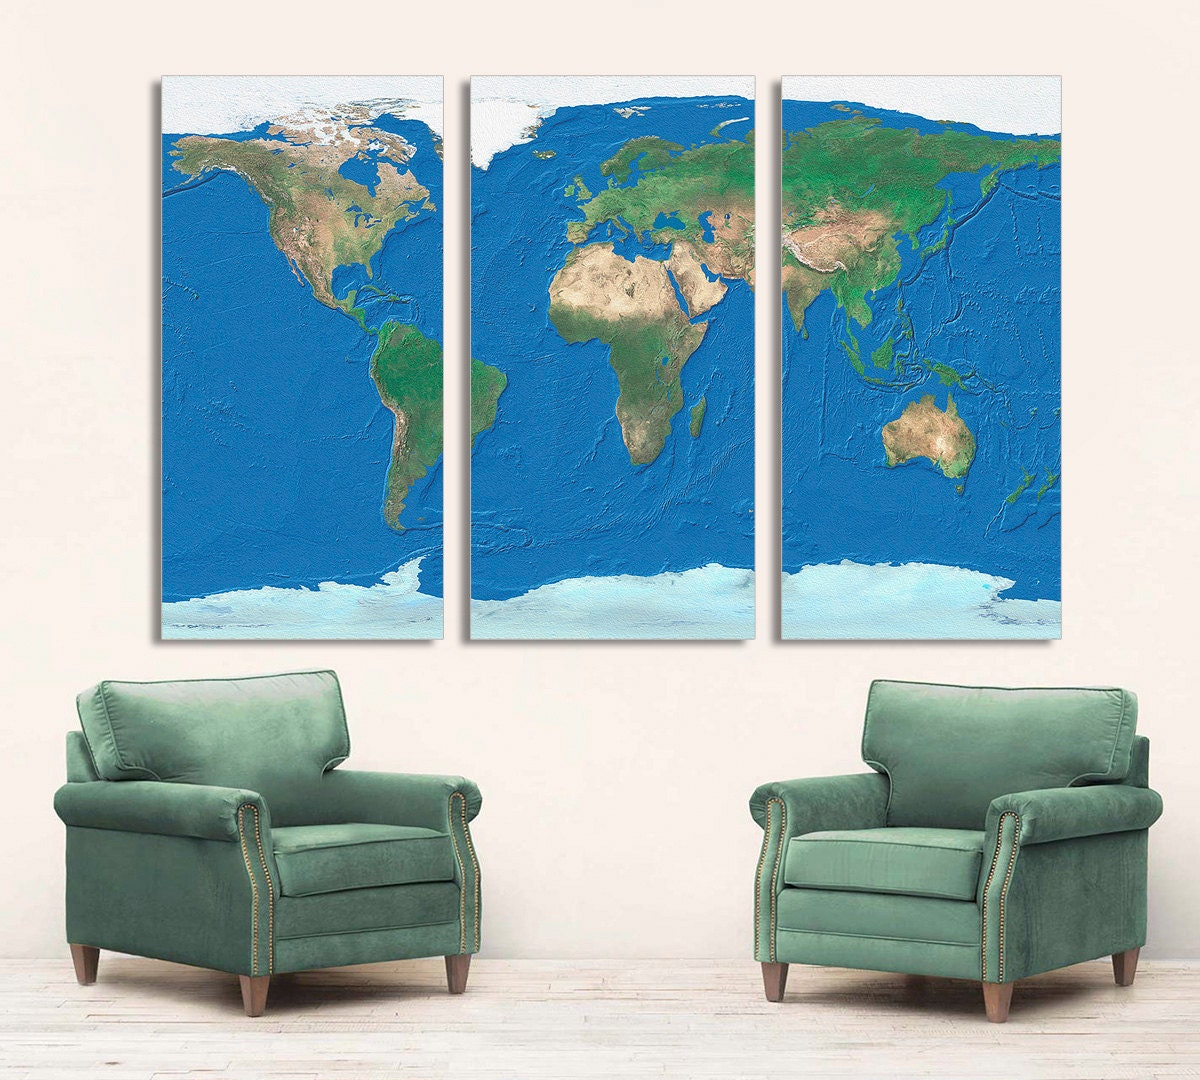 3 Panel Split Art World Map Canvas Print Triptych For: 3 Panel Split World Map Canvas Print. Digitally Bubble Texture